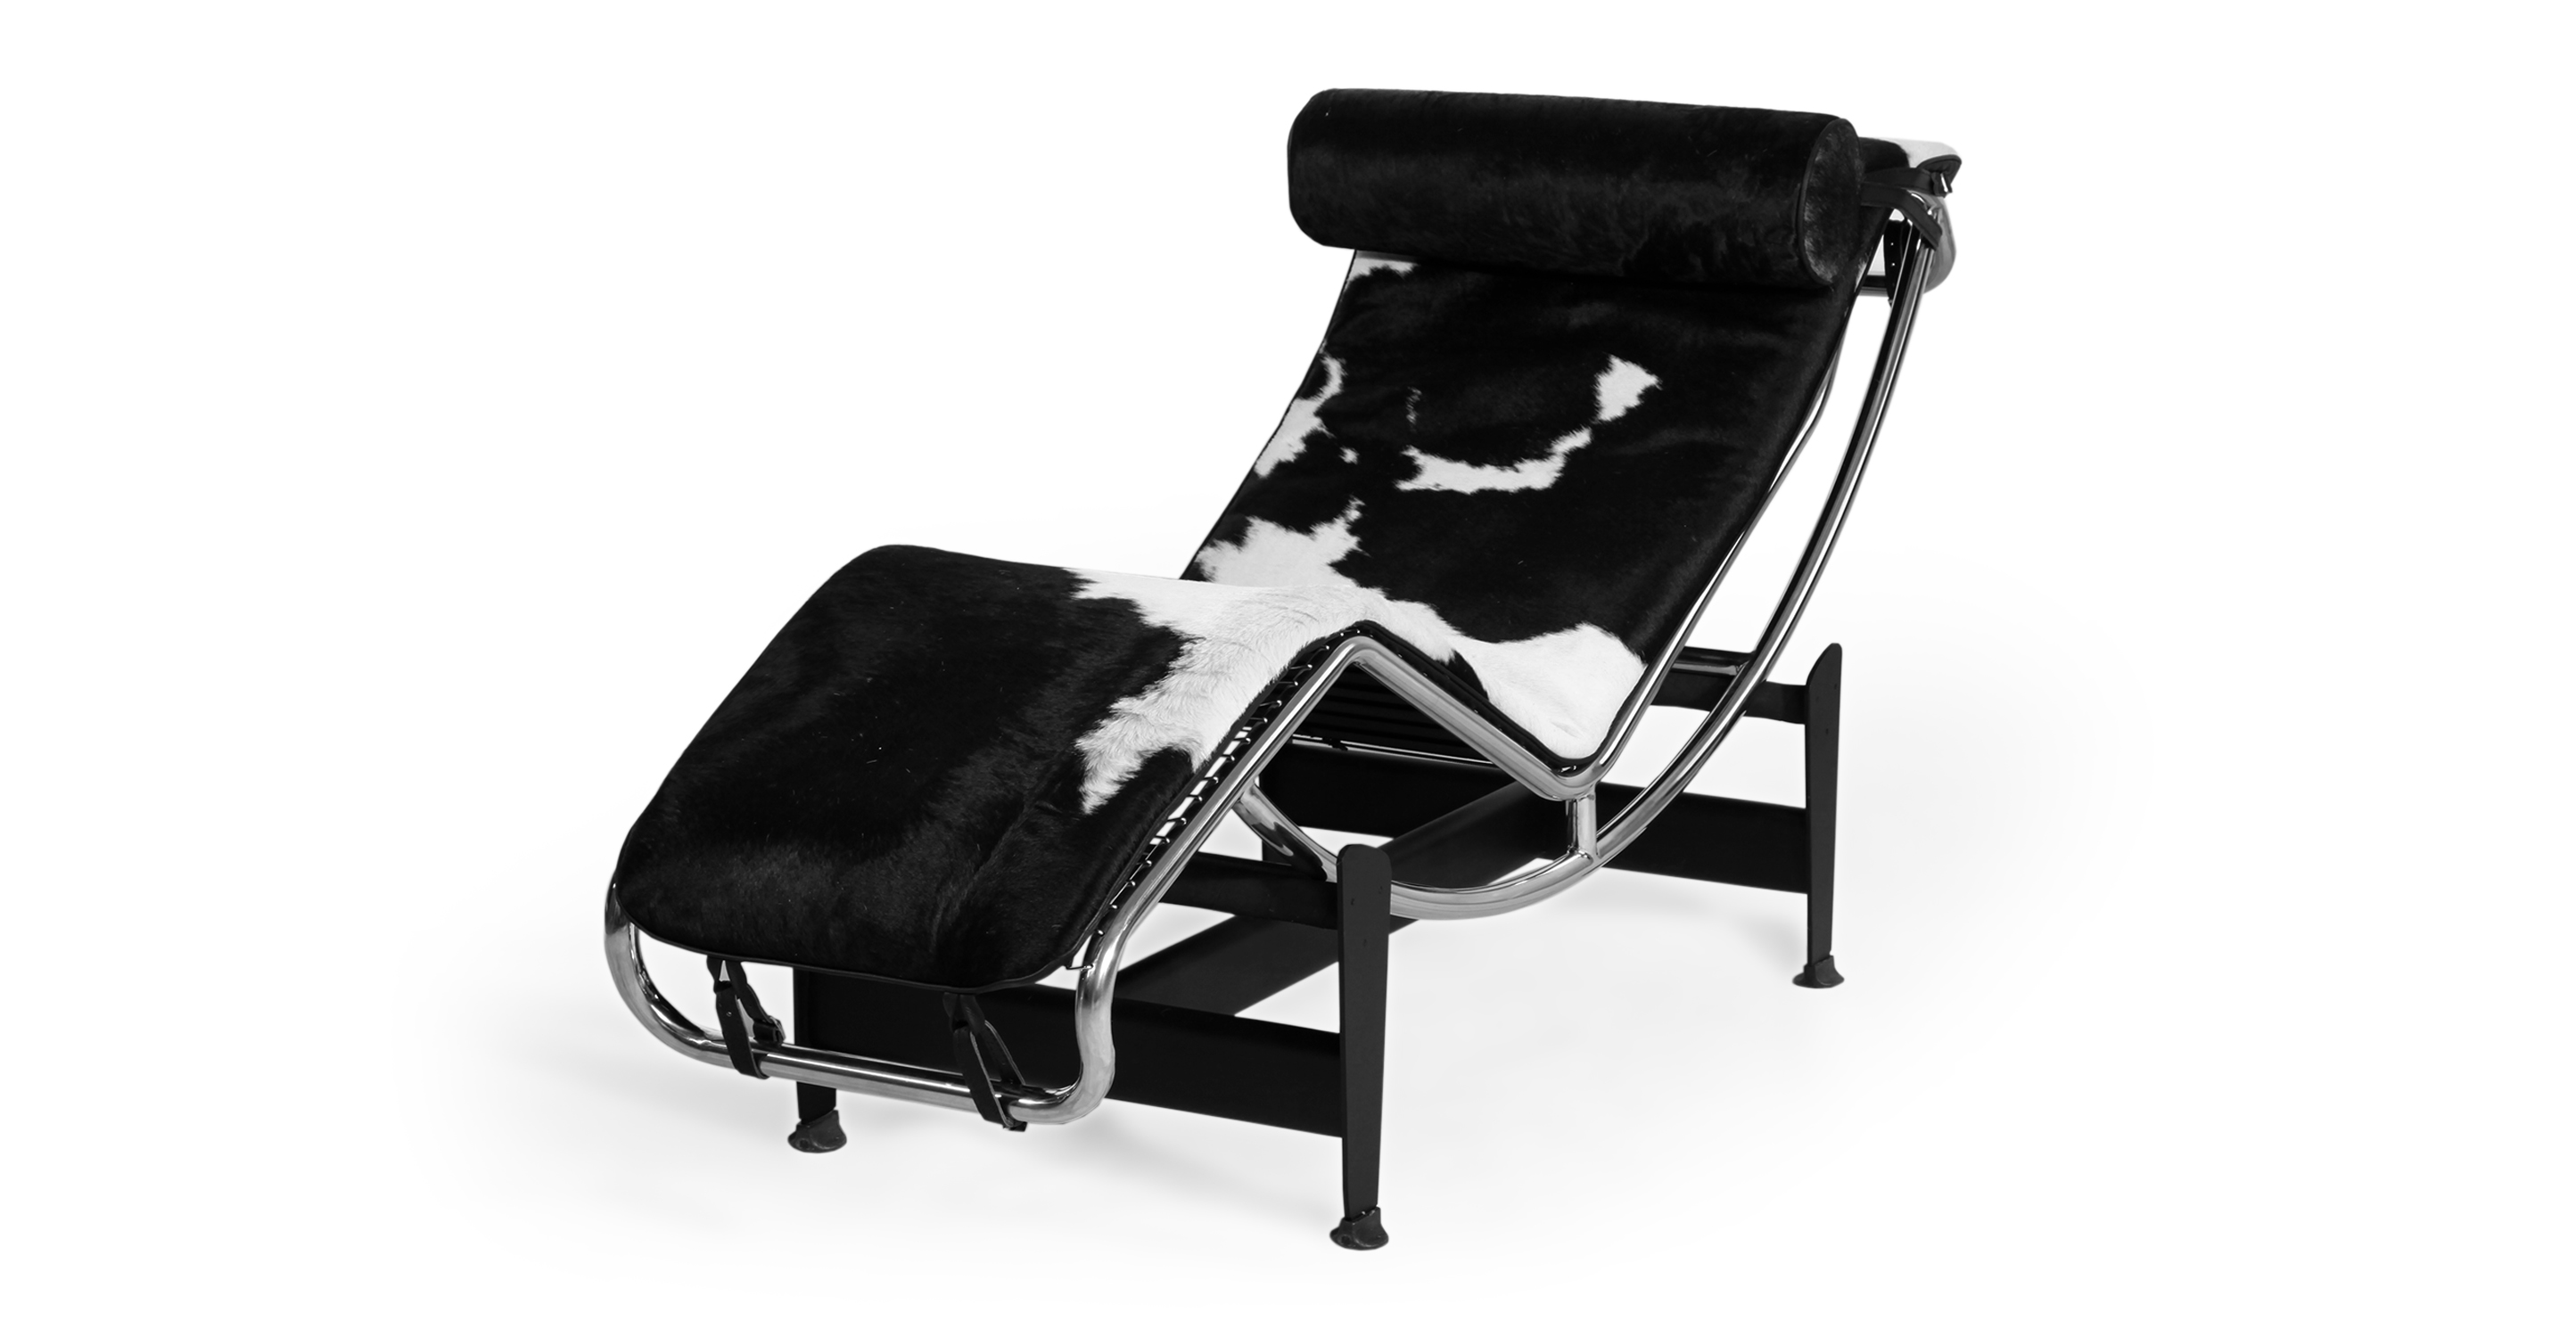 Gravity Chaise Lounge, Black & White Cowhide